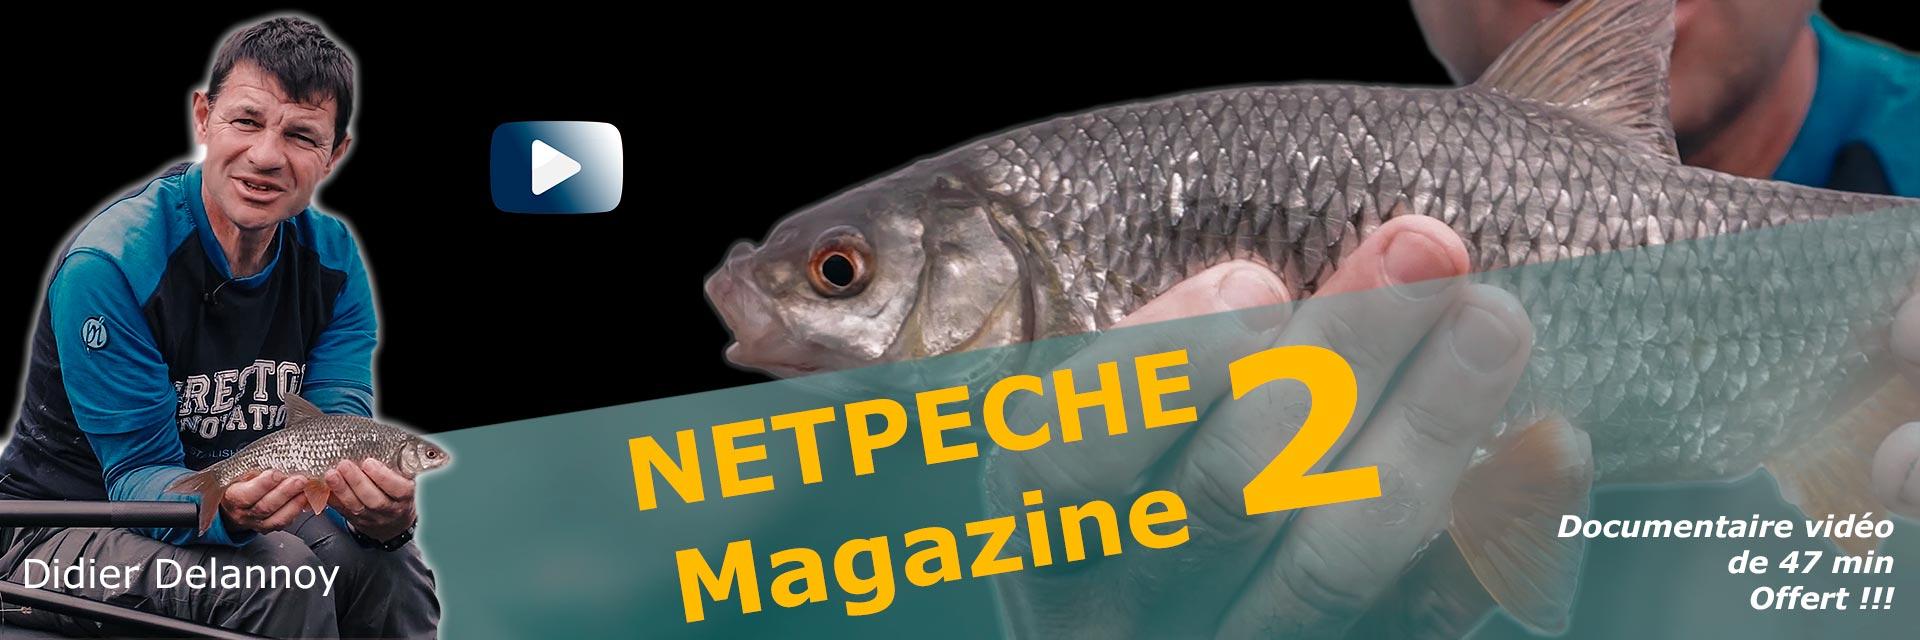 banniere netpeche magazine 2